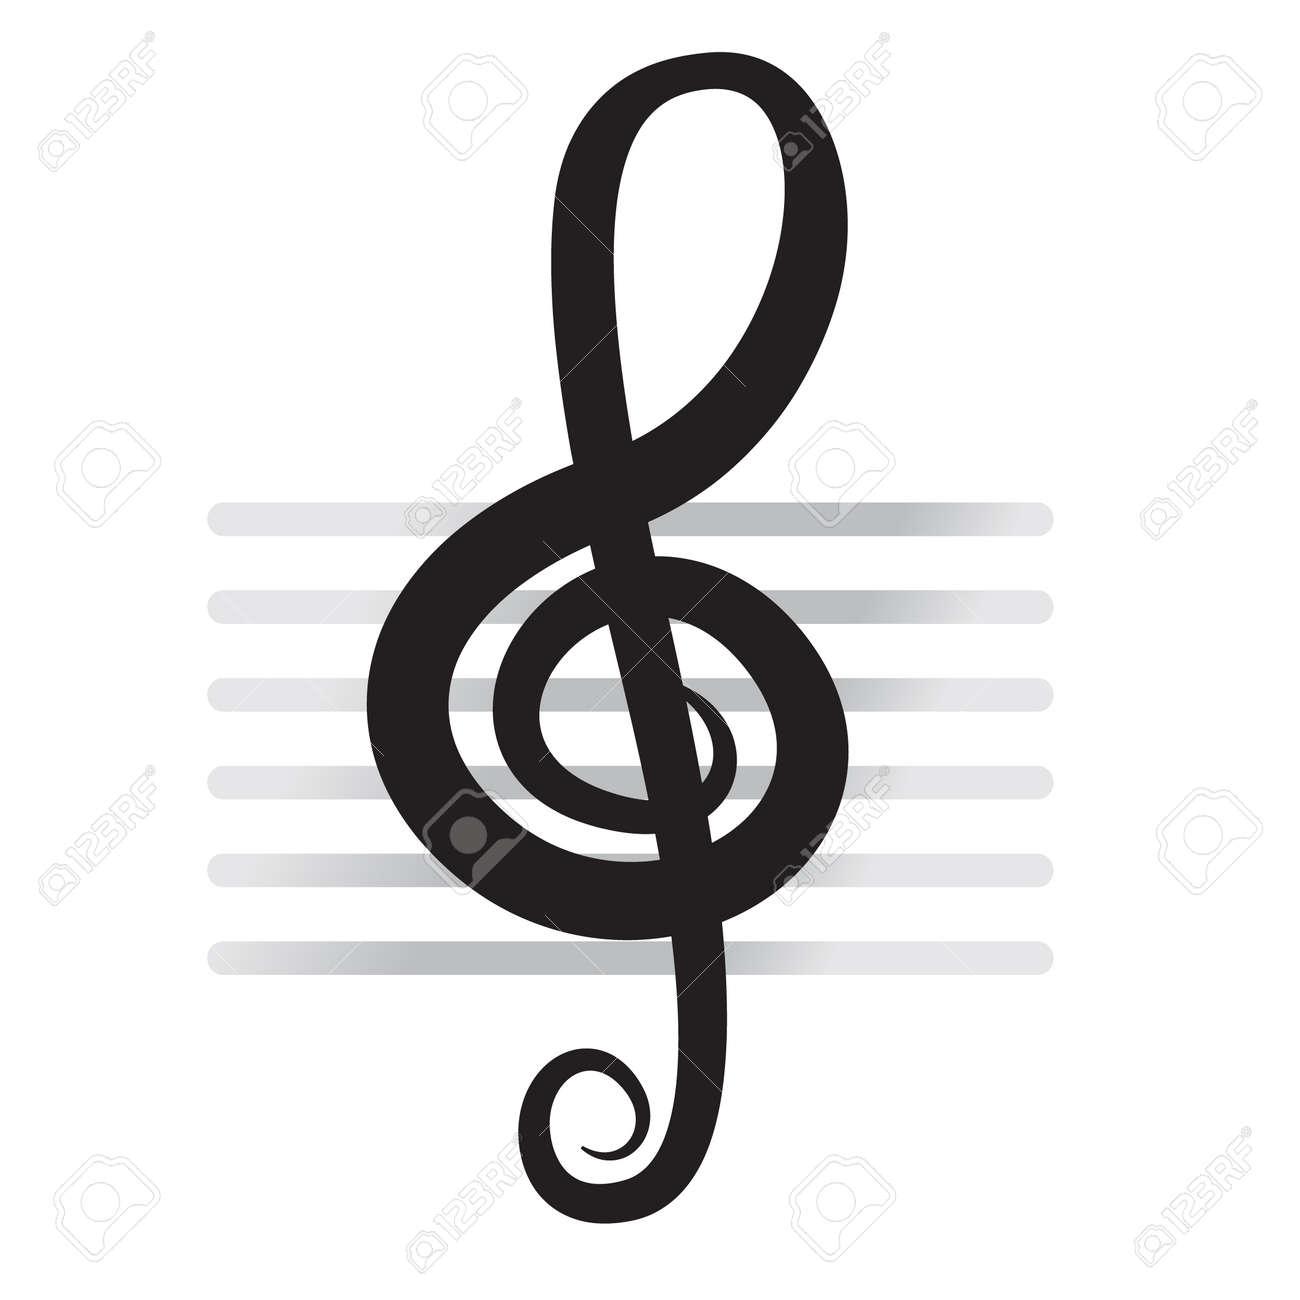 Music key symbol choice image symbol and sign ideas violin key sign vector music symbol black royalty free cliparts violin key sign vector music symbol biocorpaavc Images